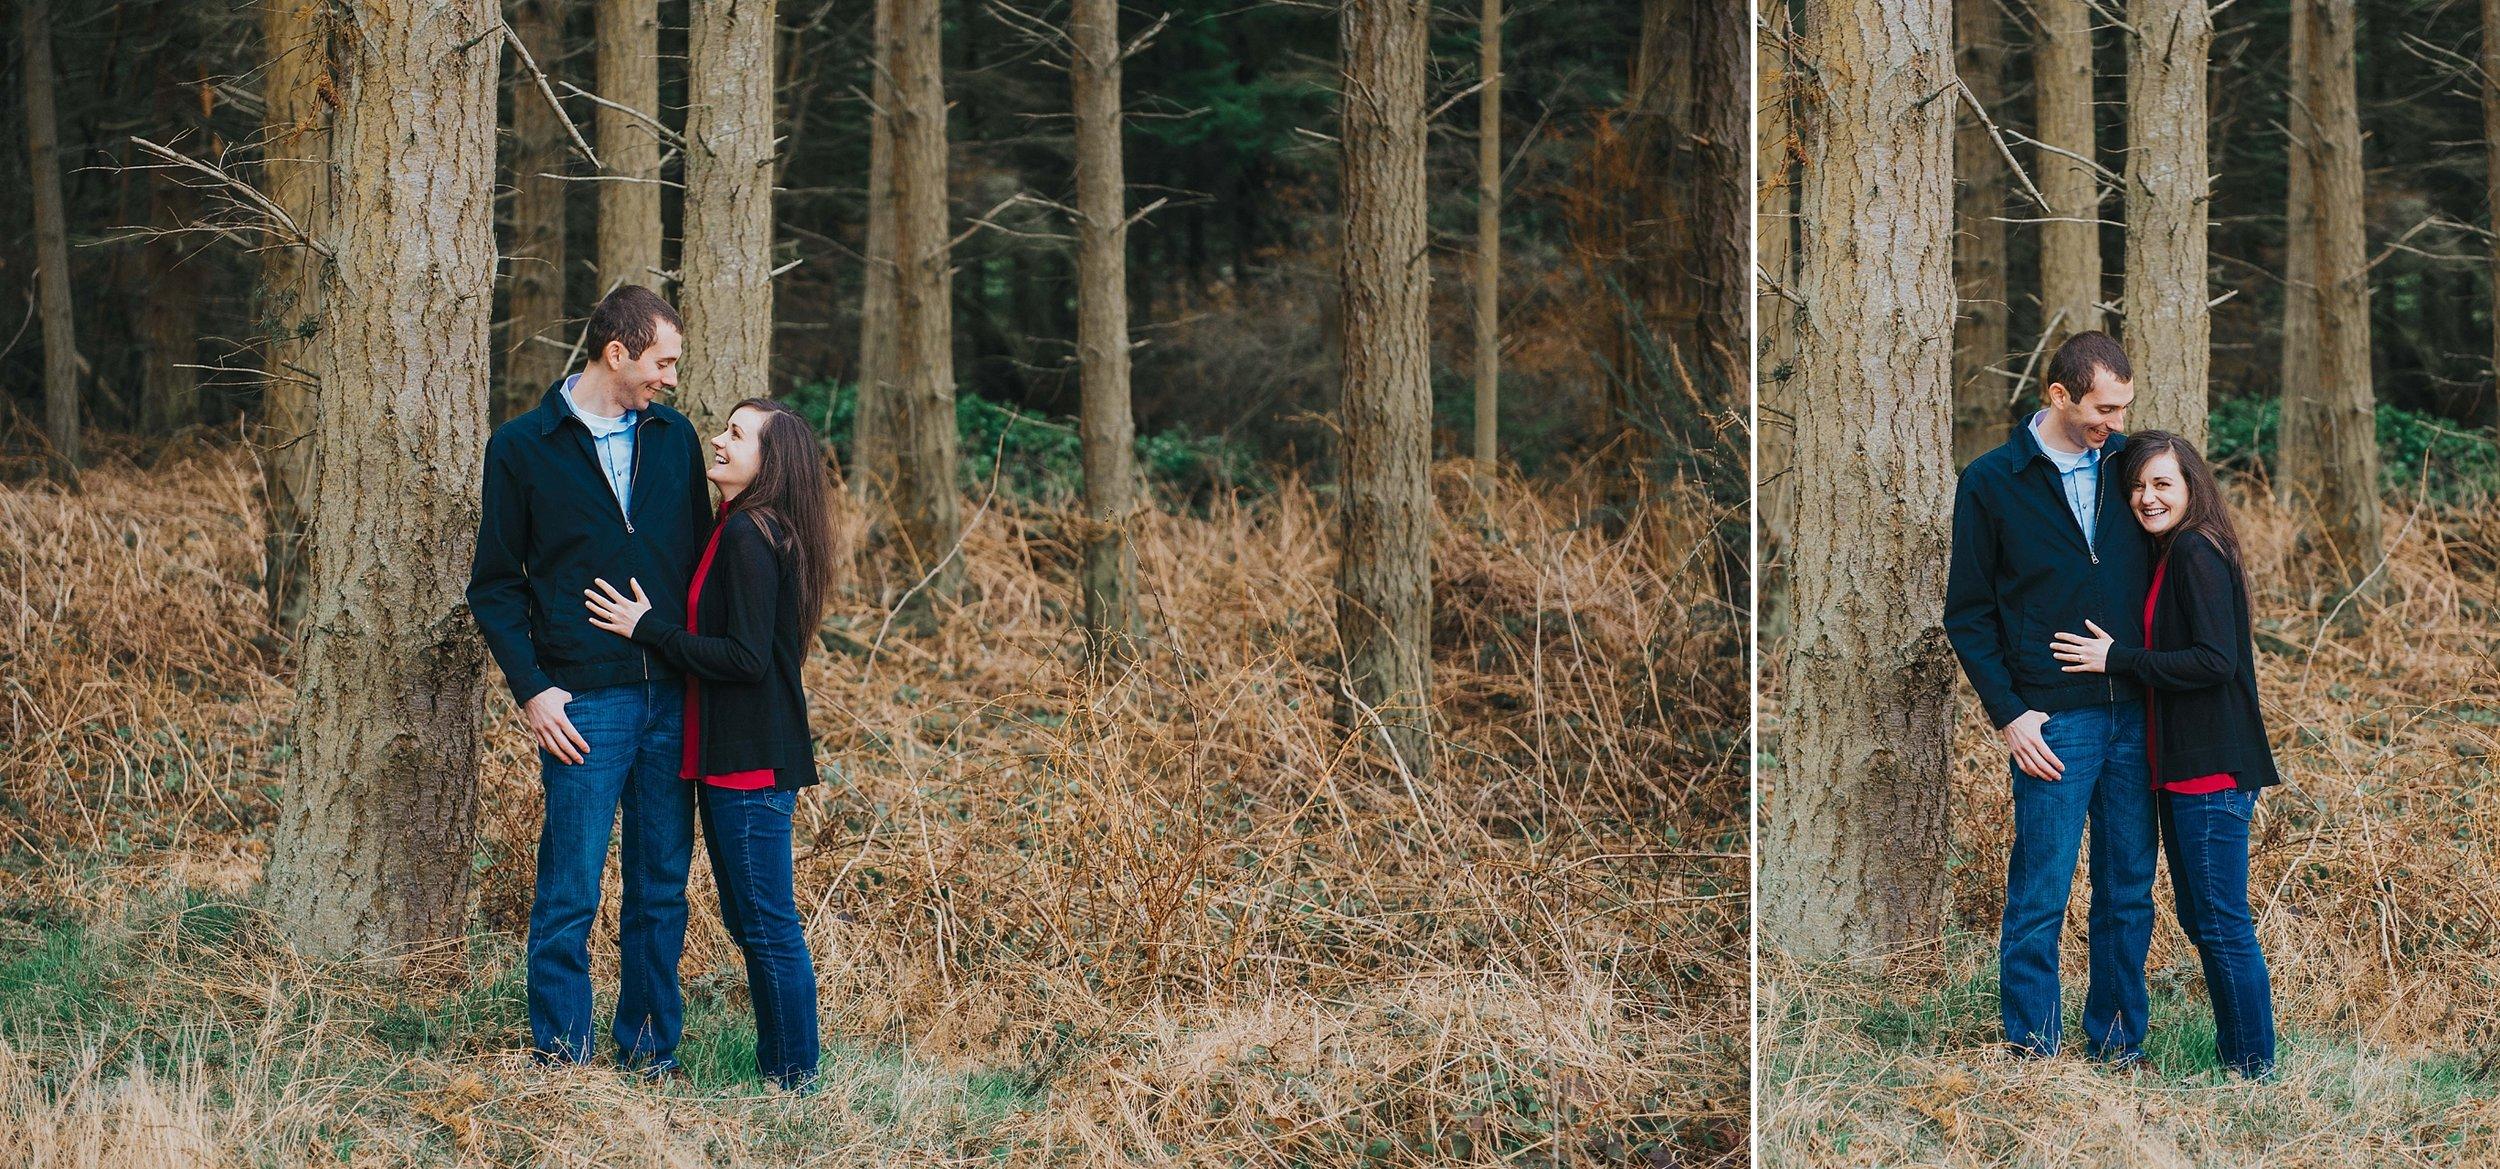 OAK-HARBOR-engagement-photographer-J HODGES PHOTOGRAPHY_0101.jpg